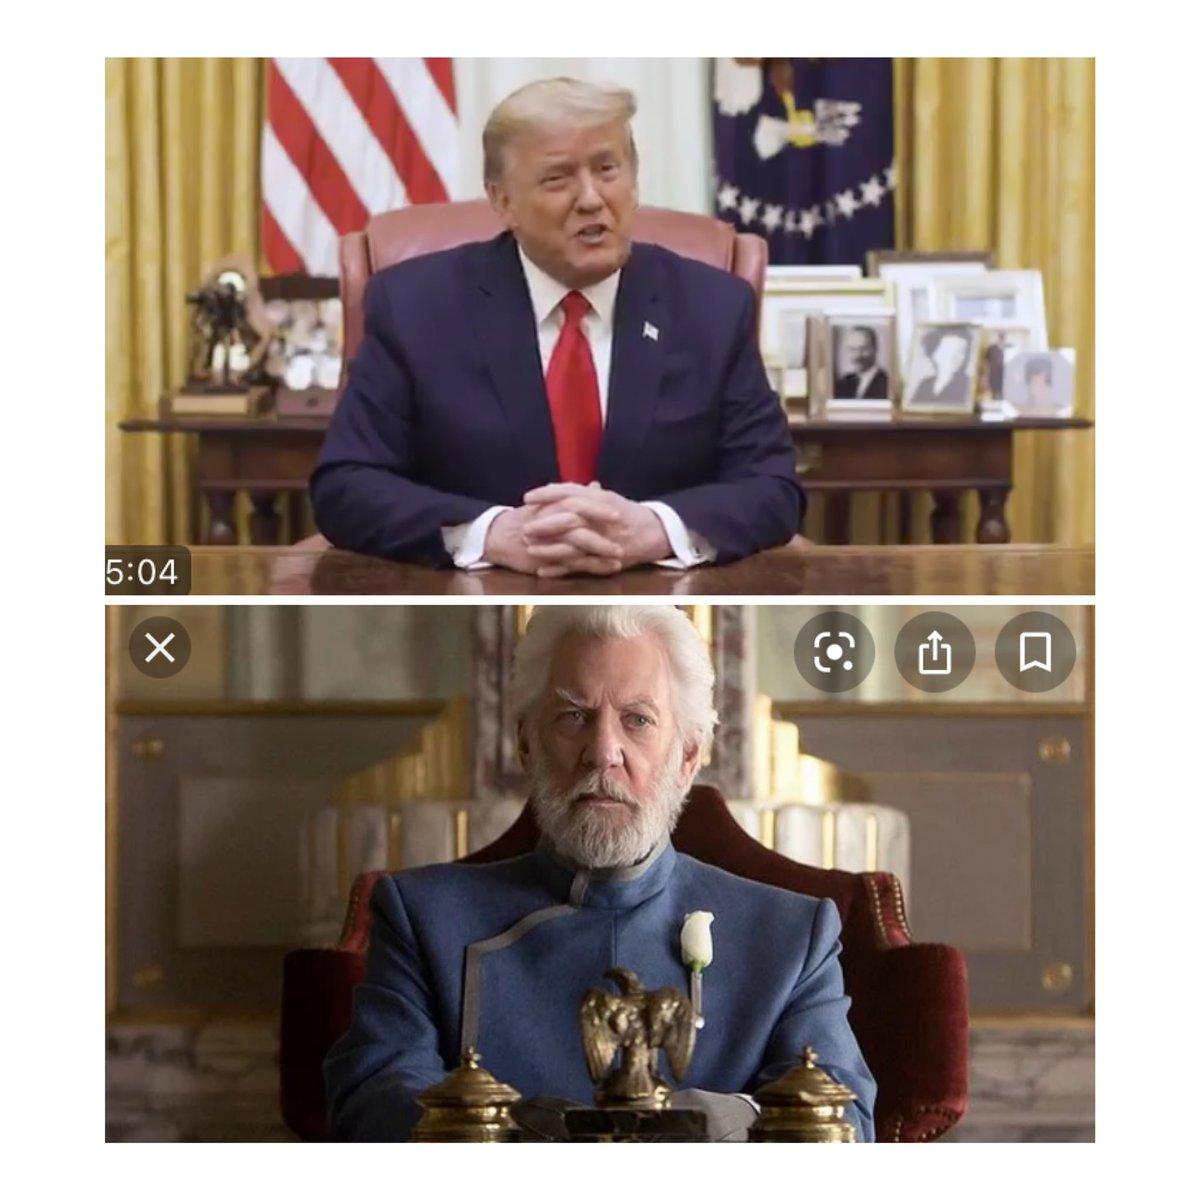 👏🏻👏🏻SAME ENERGY👏🏻👏🏻 @BuzzFeedNews @cnnbrk @MSNBC @CNNPolitics @BradleyWhitford @cnni #ImpeachedTwice #ImpeachmentDay #TrumpImpeachment